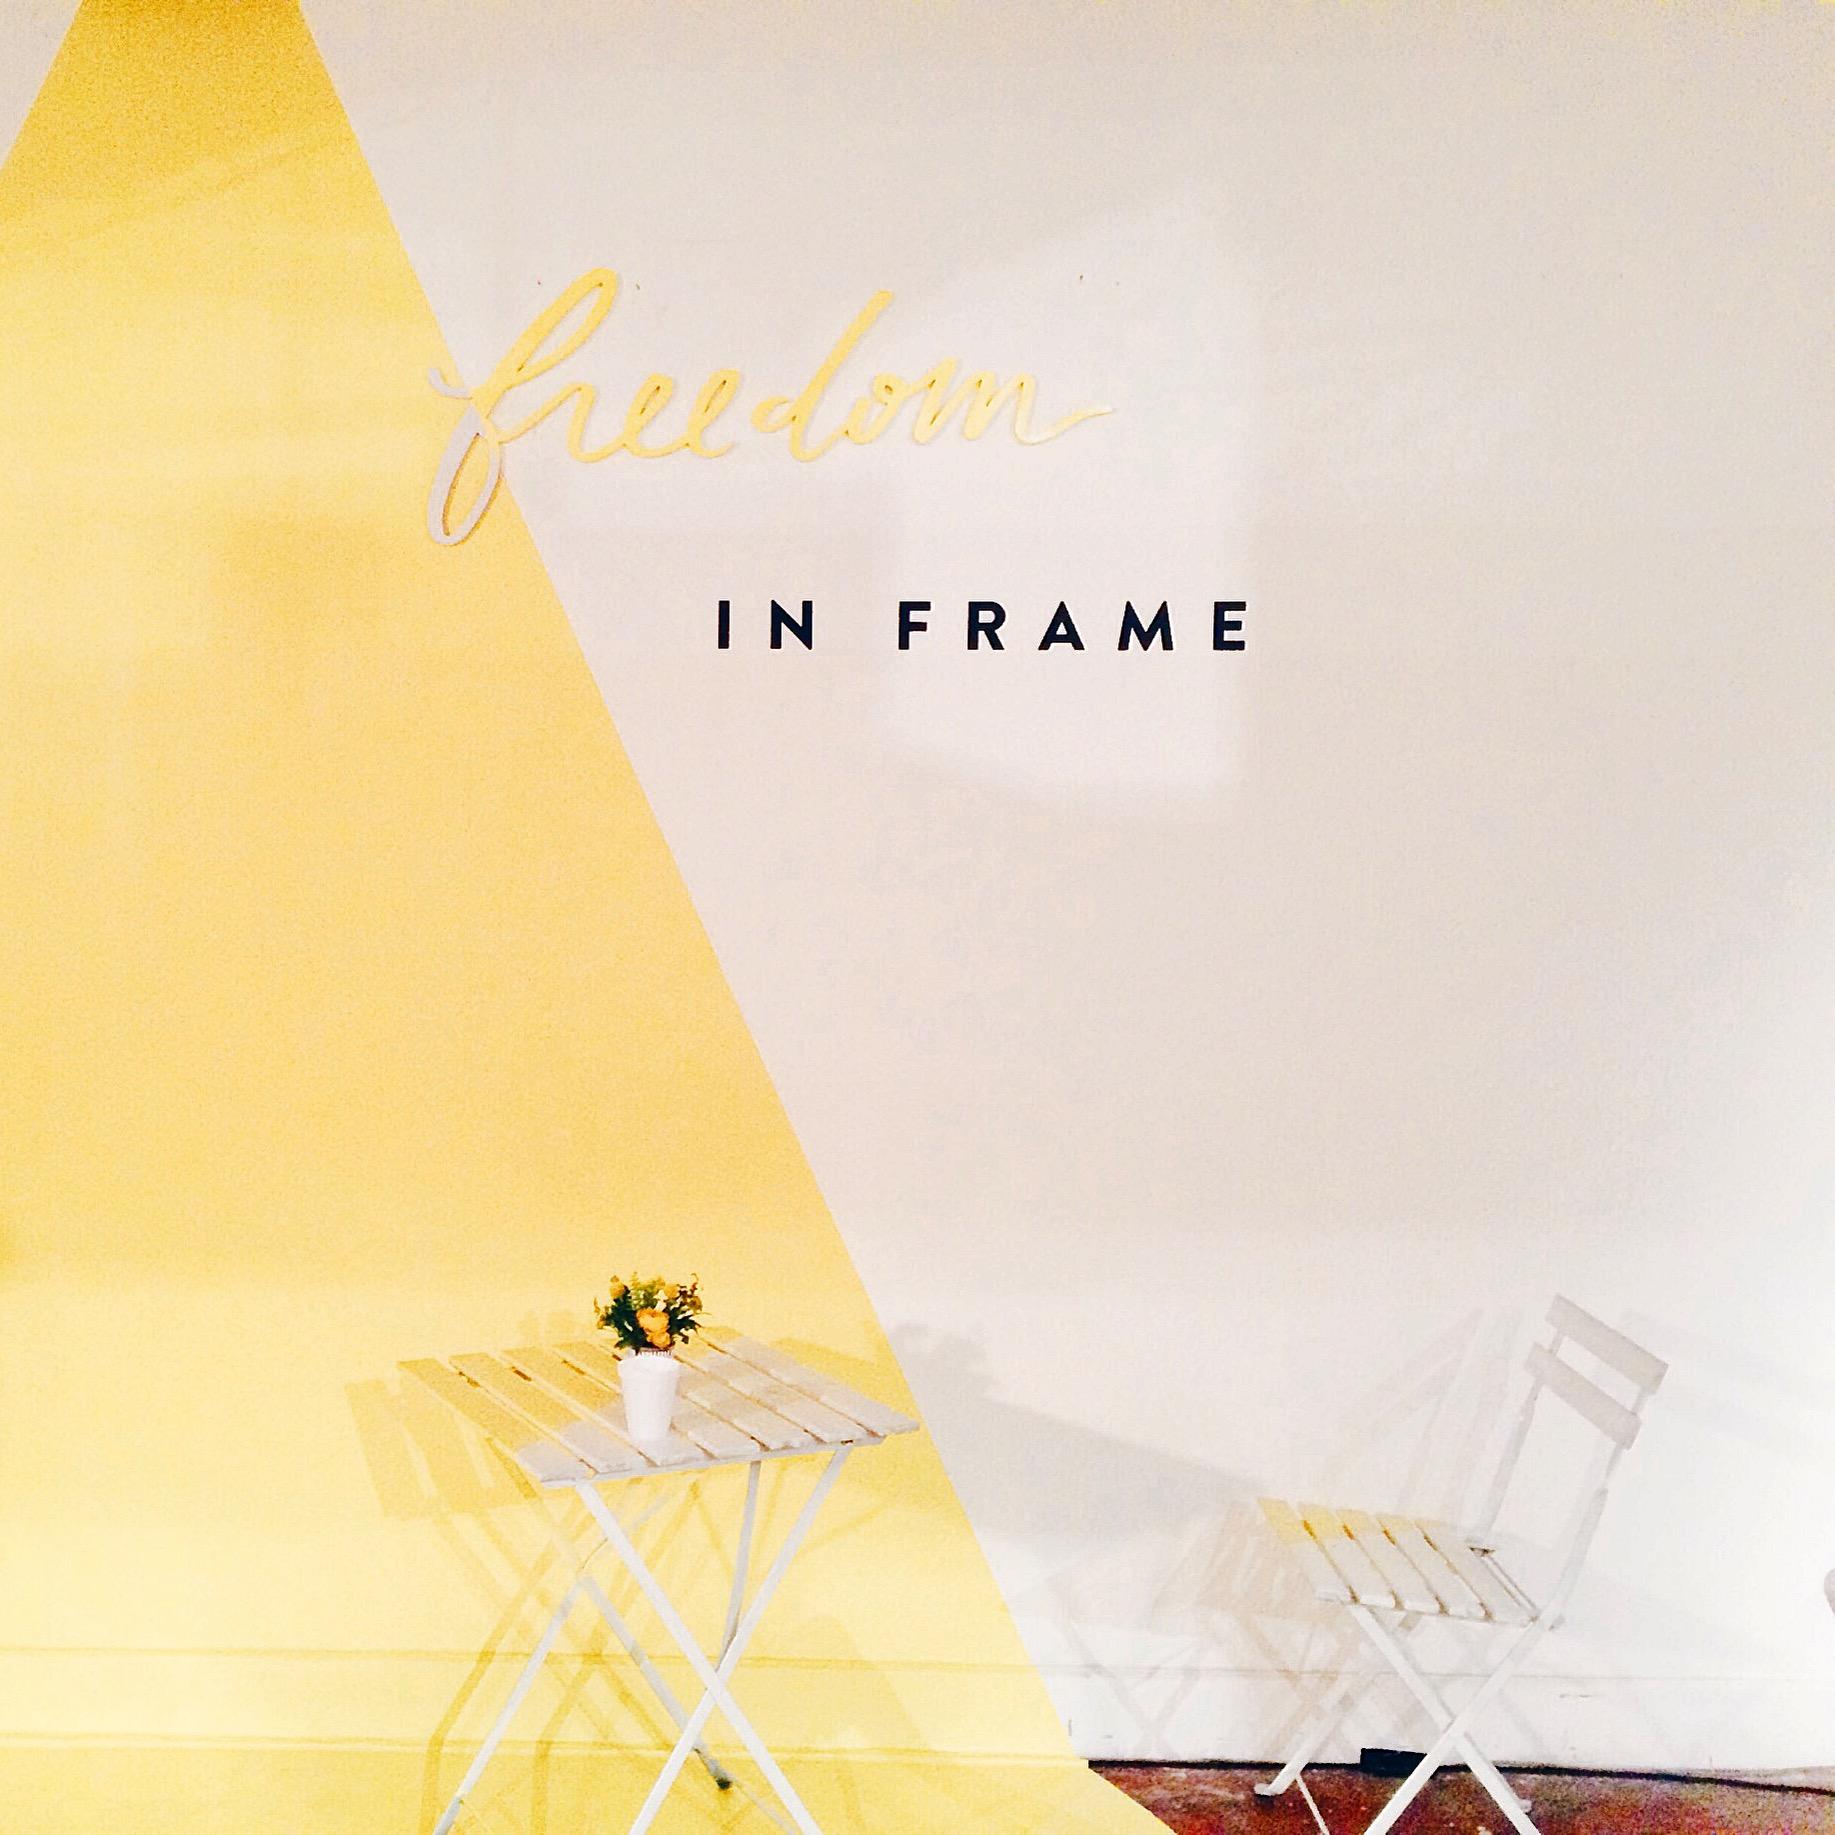 Freedom in frame